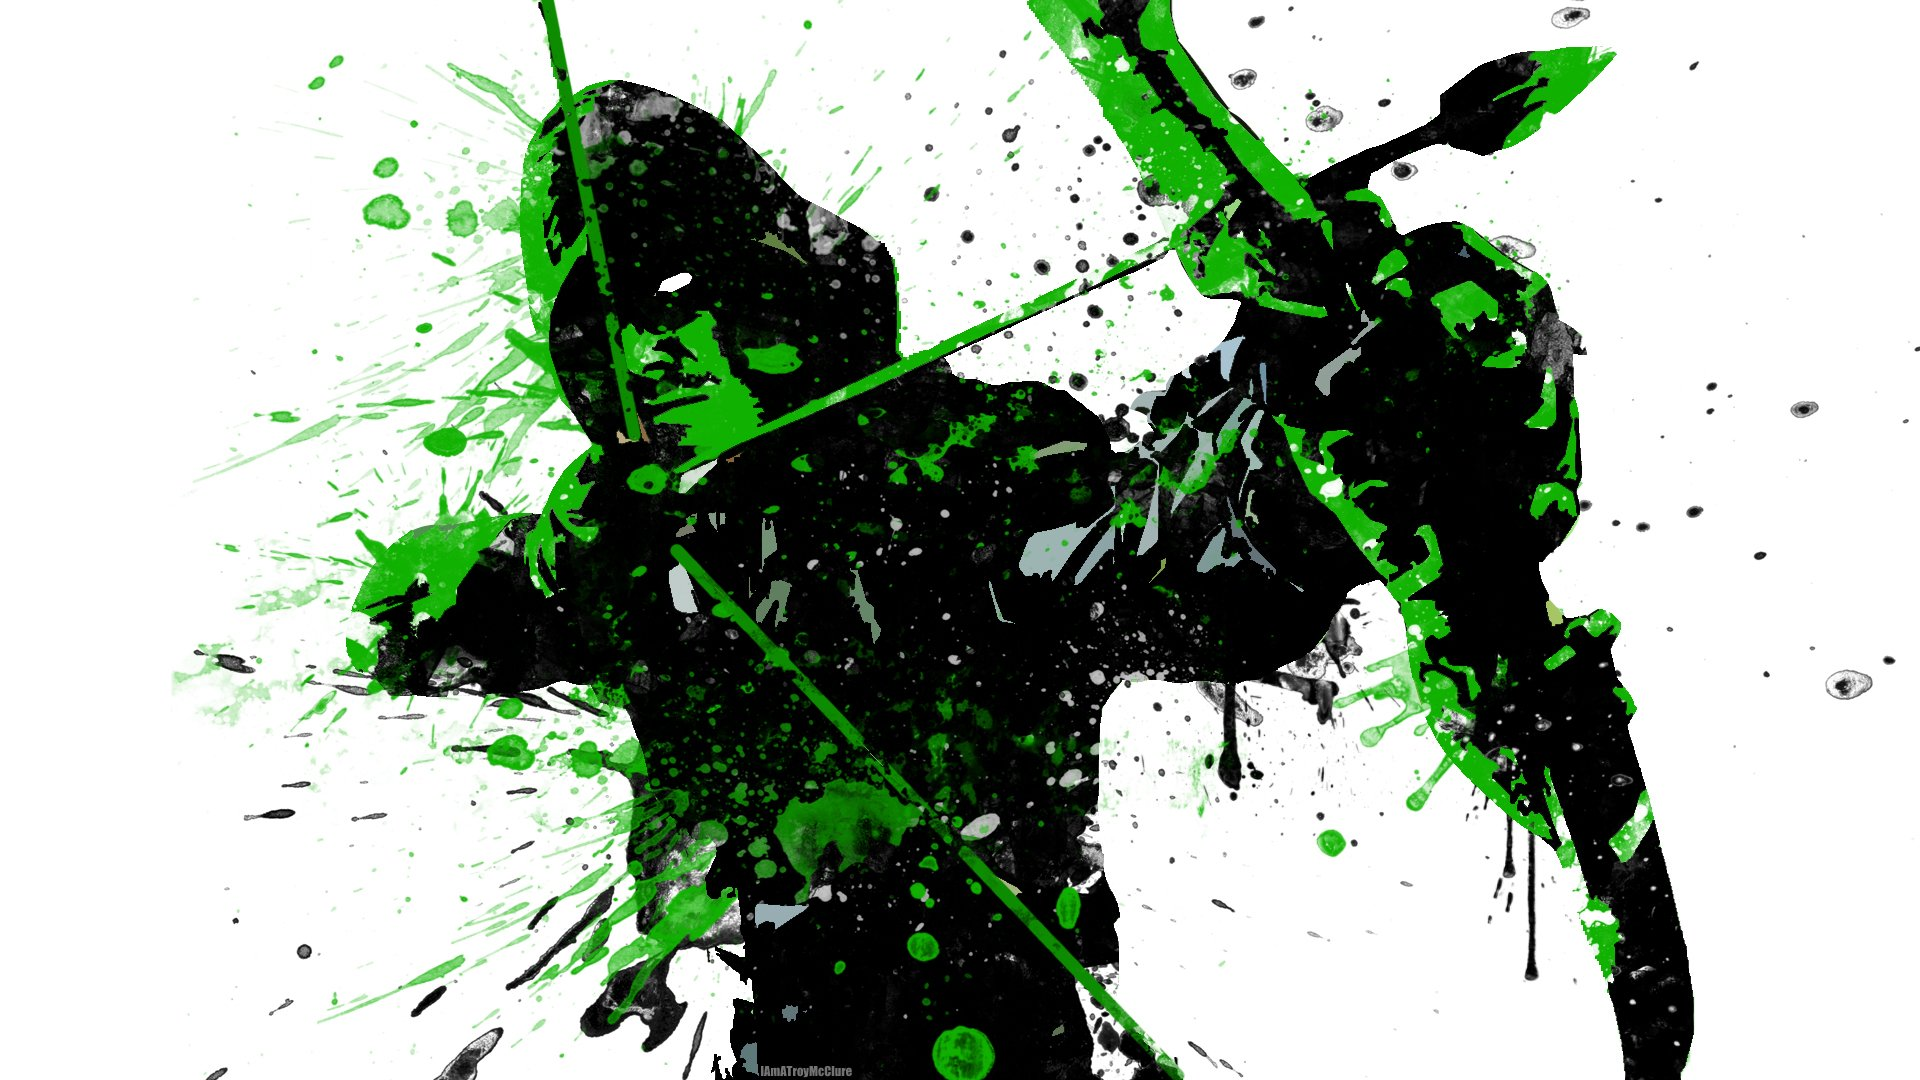 Green arrow image graphic transparent stock 165 Green Arrow HD Wallpapers | Backgrounds - Wallpaper Abyss graphic transparent stock